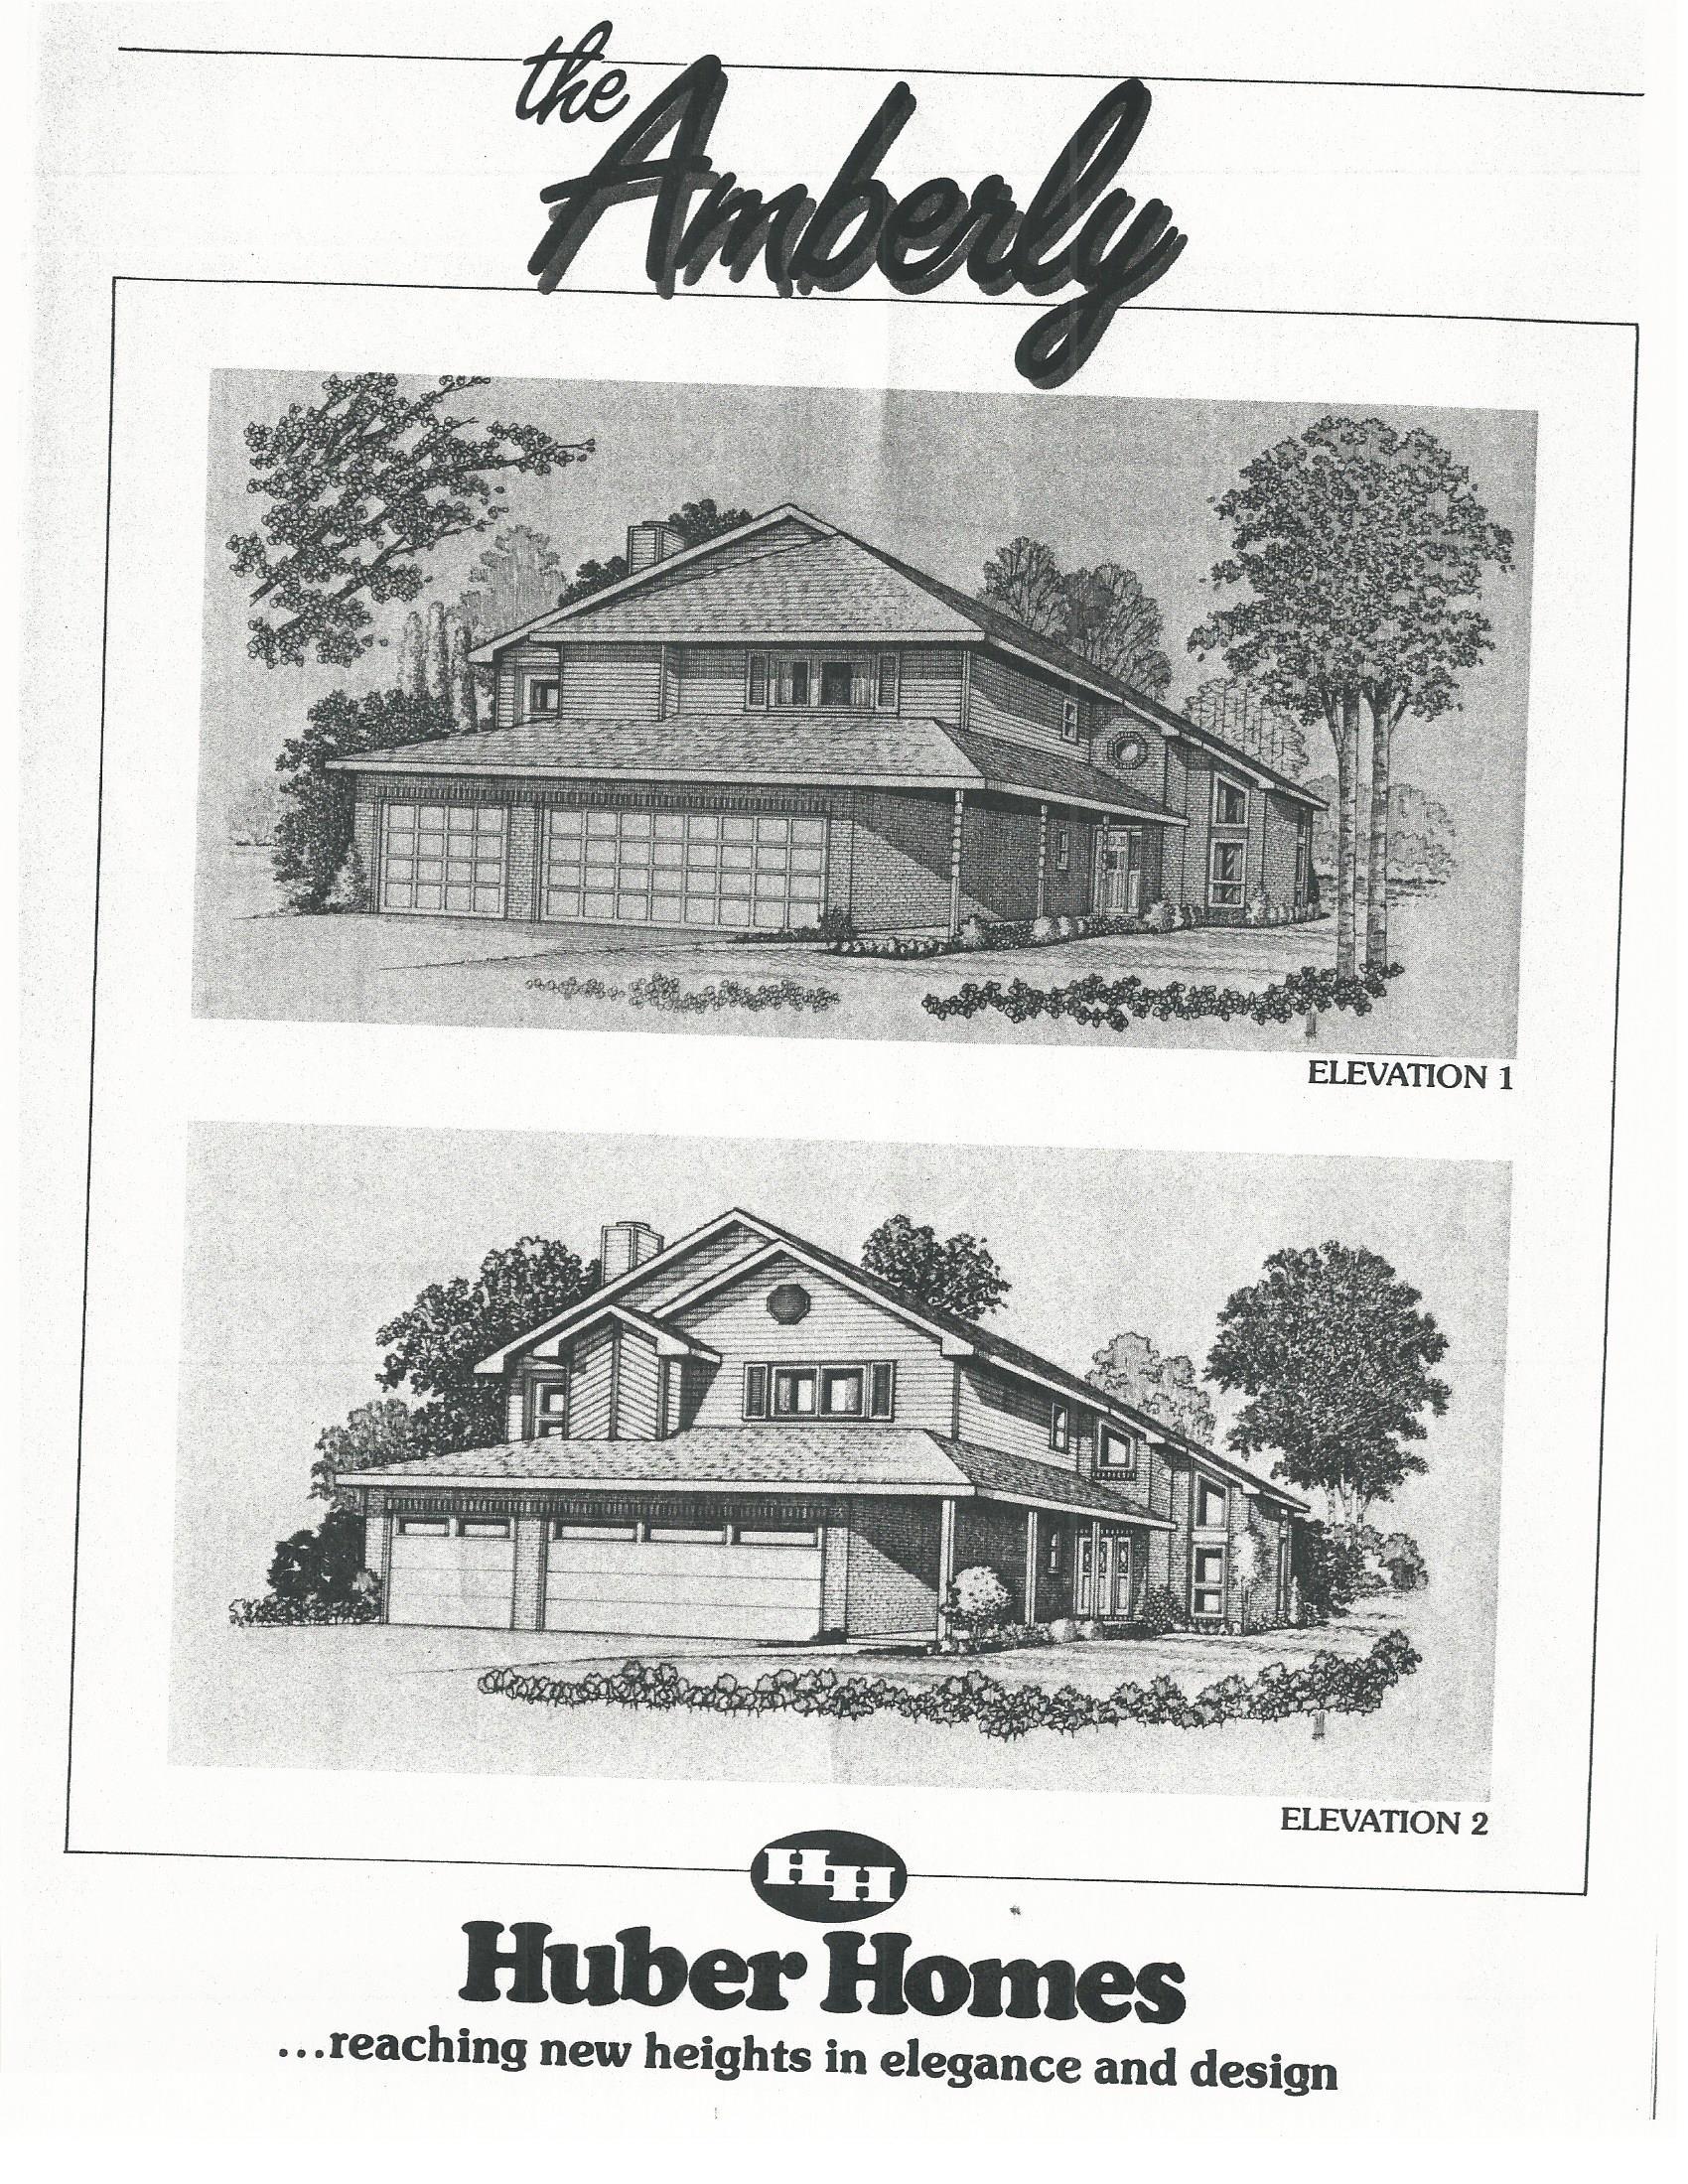 Huber Homes Amberly model